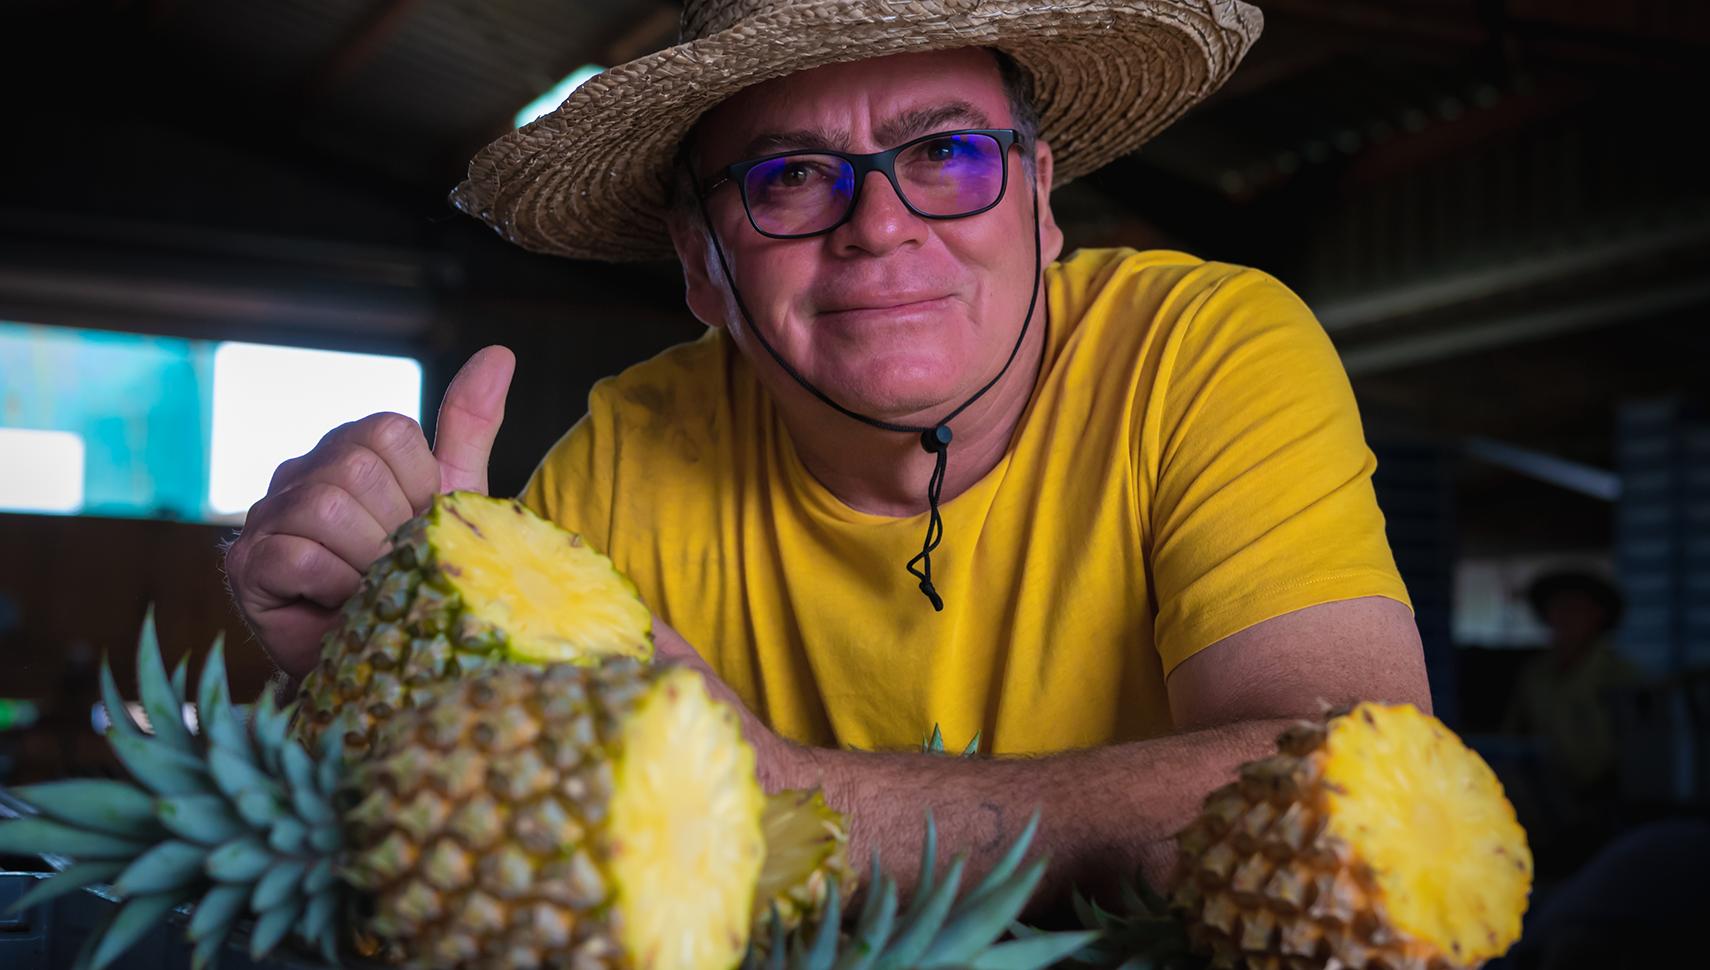 Christian Barret ananas Victoria